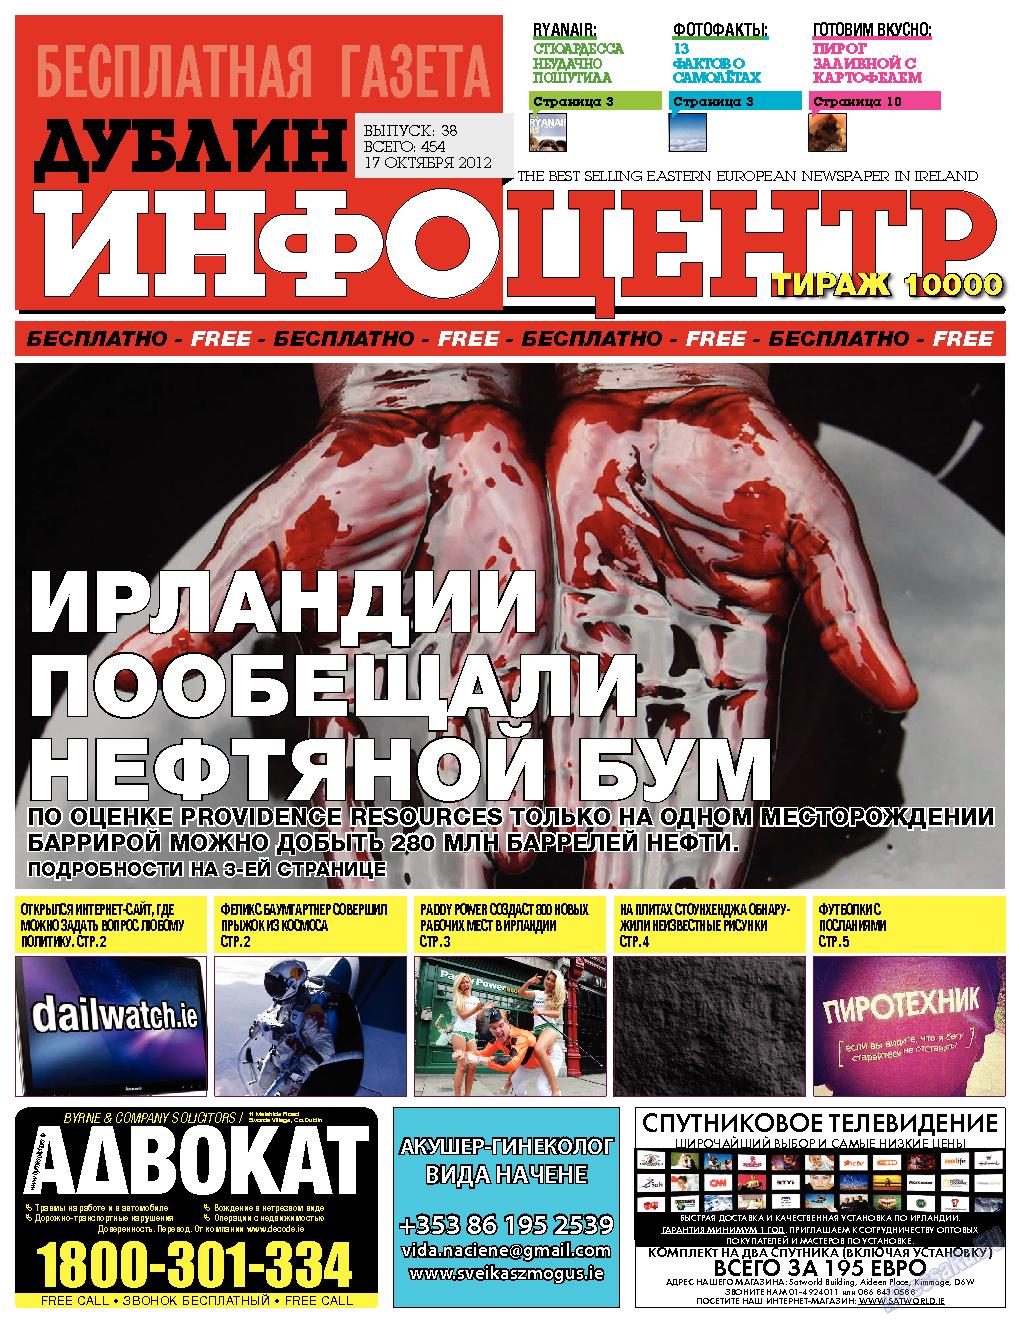 Дублин инфоцентр (газета). 2012 год, номер 38, стр. 1